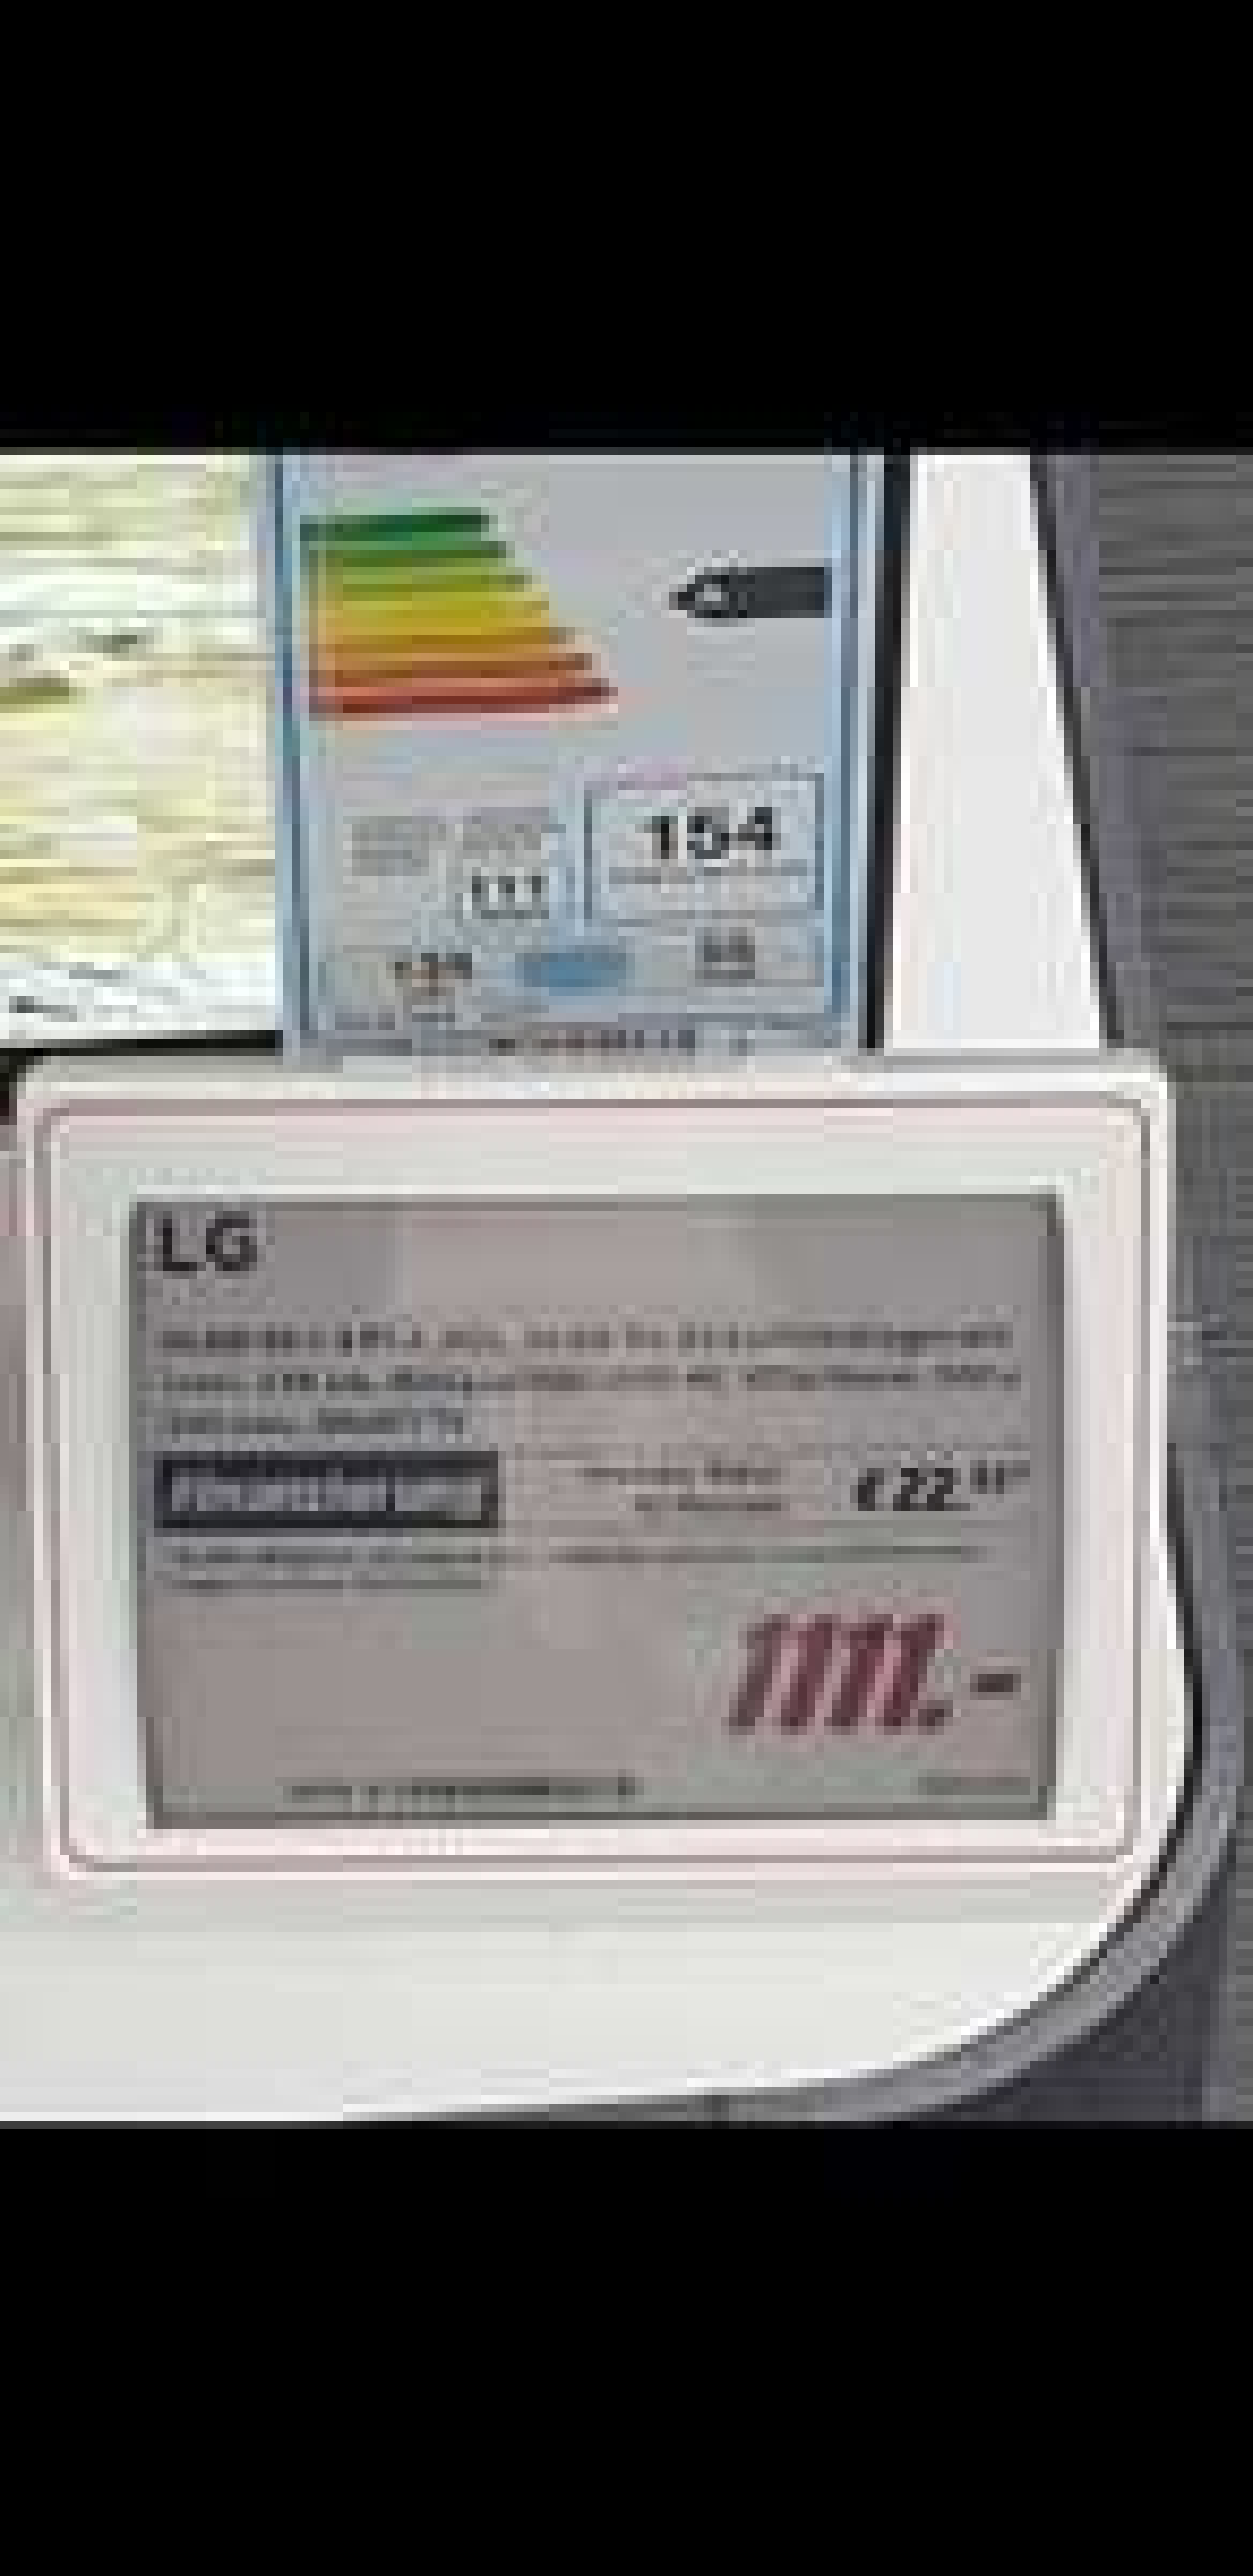 Lokal - LG OLED 55 C9 PLA Media Markt Ingolstadt